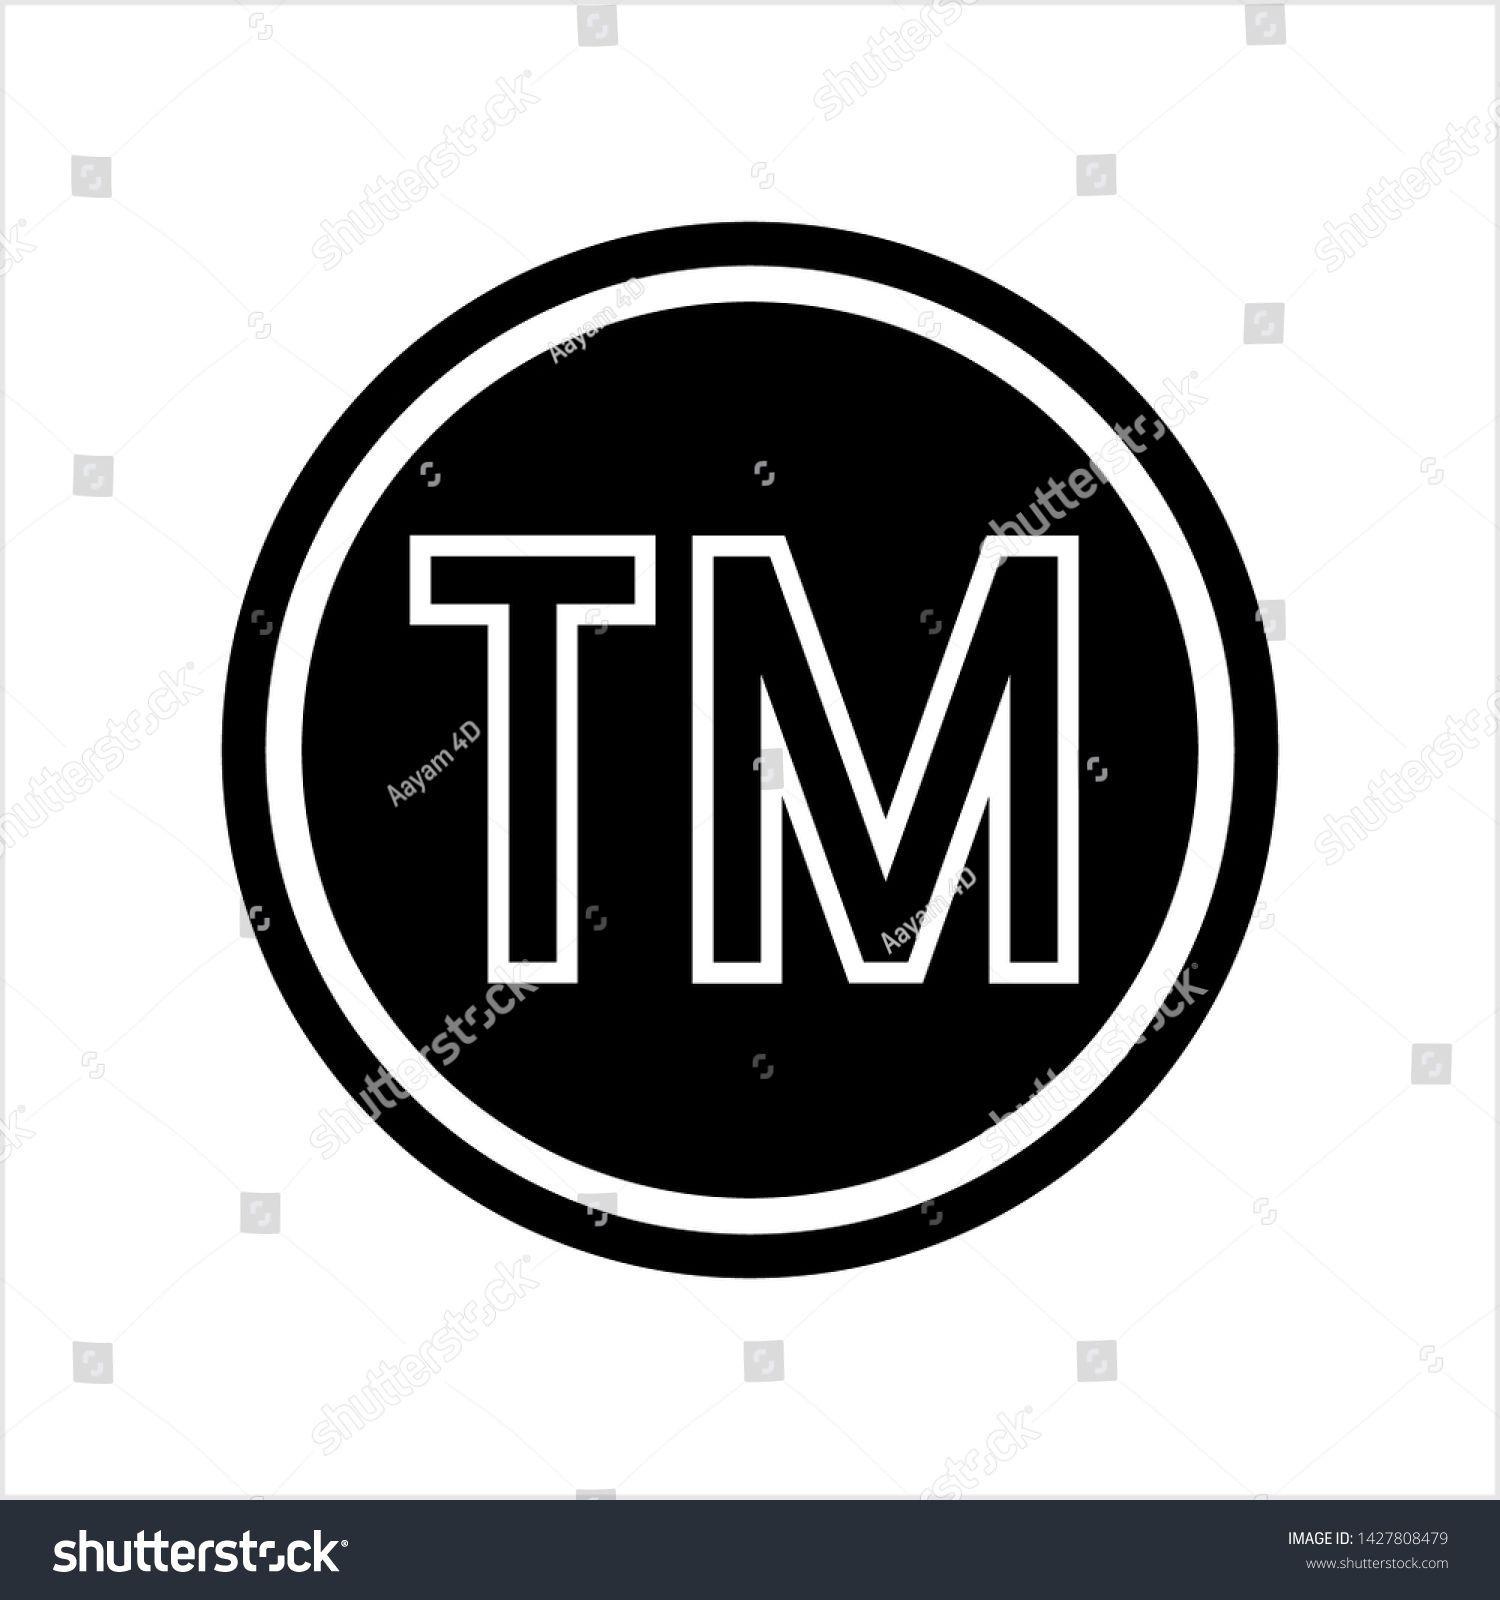 Tm Trademark Symbol Icon Tm Symbol Unregistered Trademark Symbol Icon Vector Art Illustration Ad Affilia Trademark Symbol Vector Art Illustration Symbols